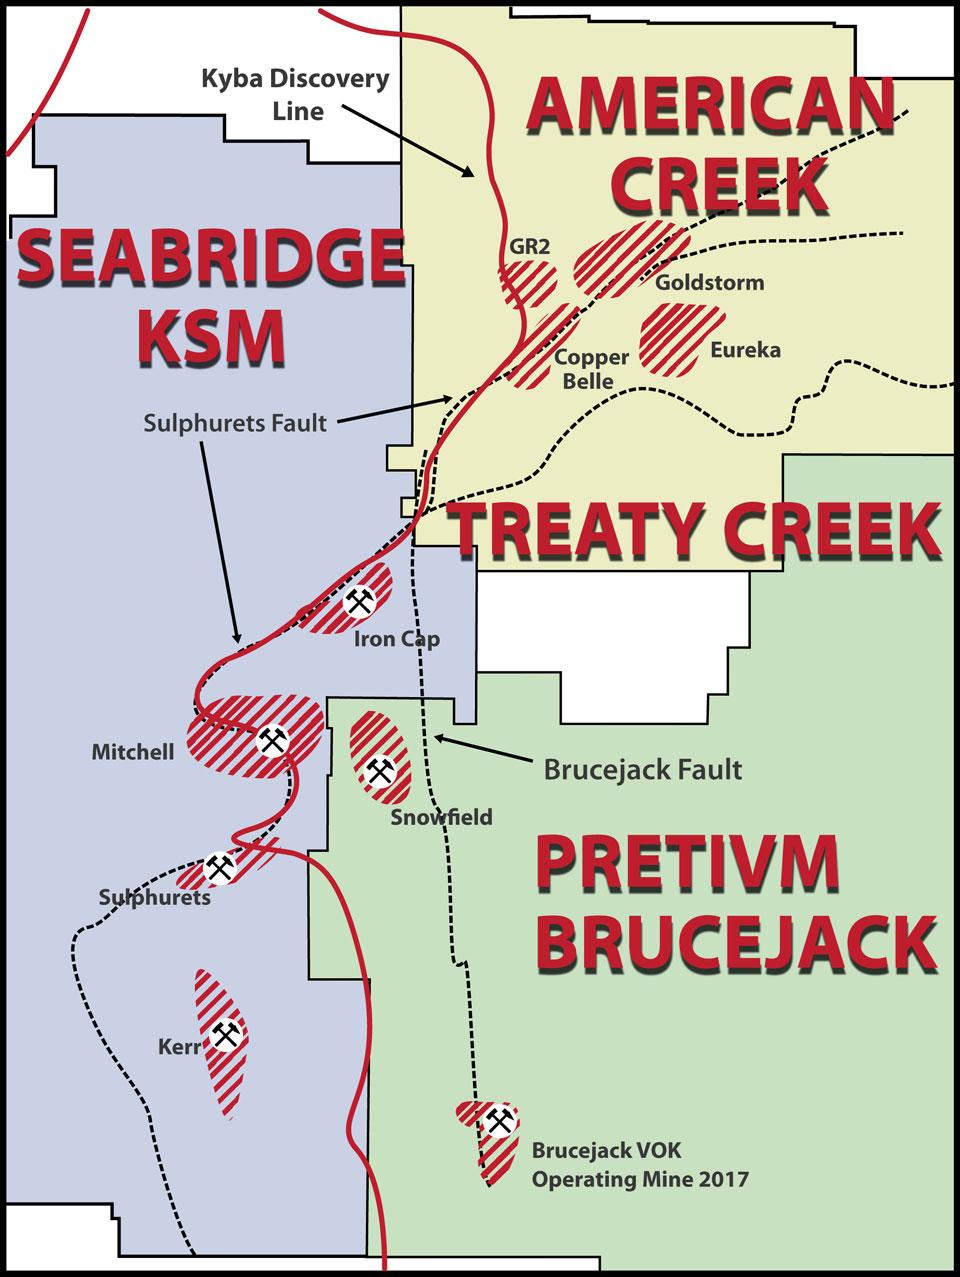 https://www.americancreek.com/images/treatycreek_map.png